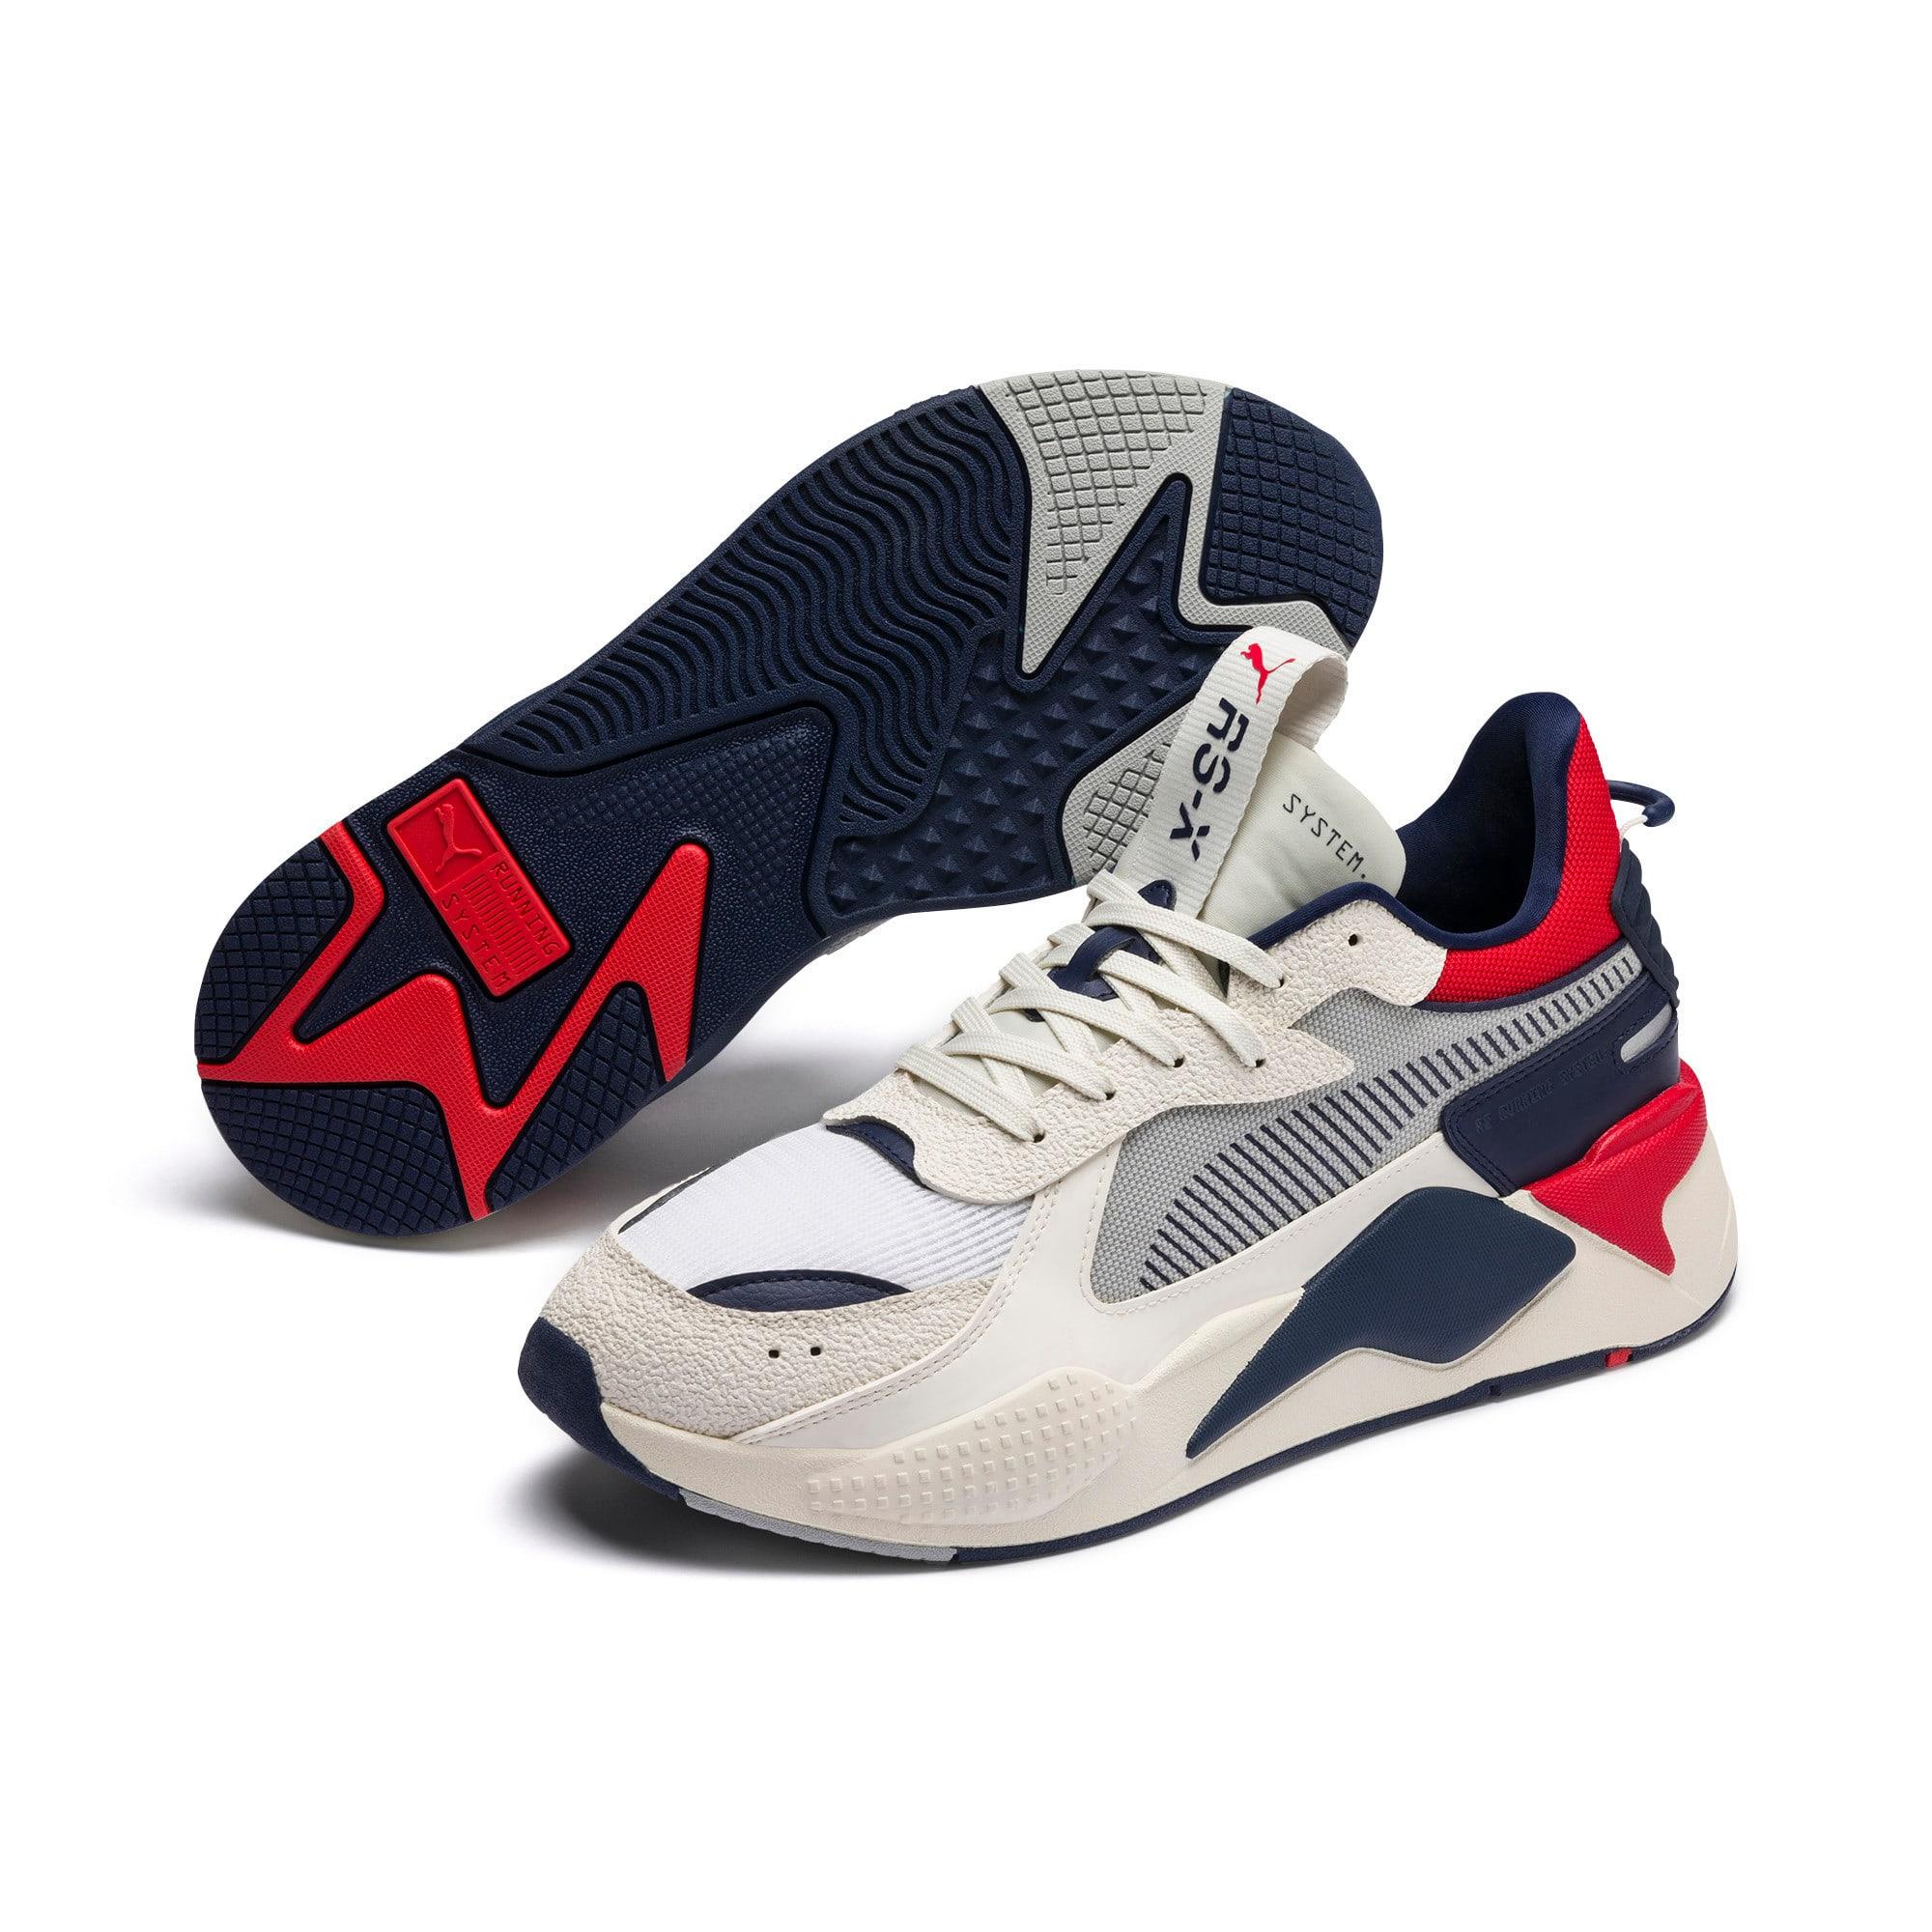 Thumbnail 3 of RS-X Hard Drive Sneakers, Whisper White-Peacoat, medium